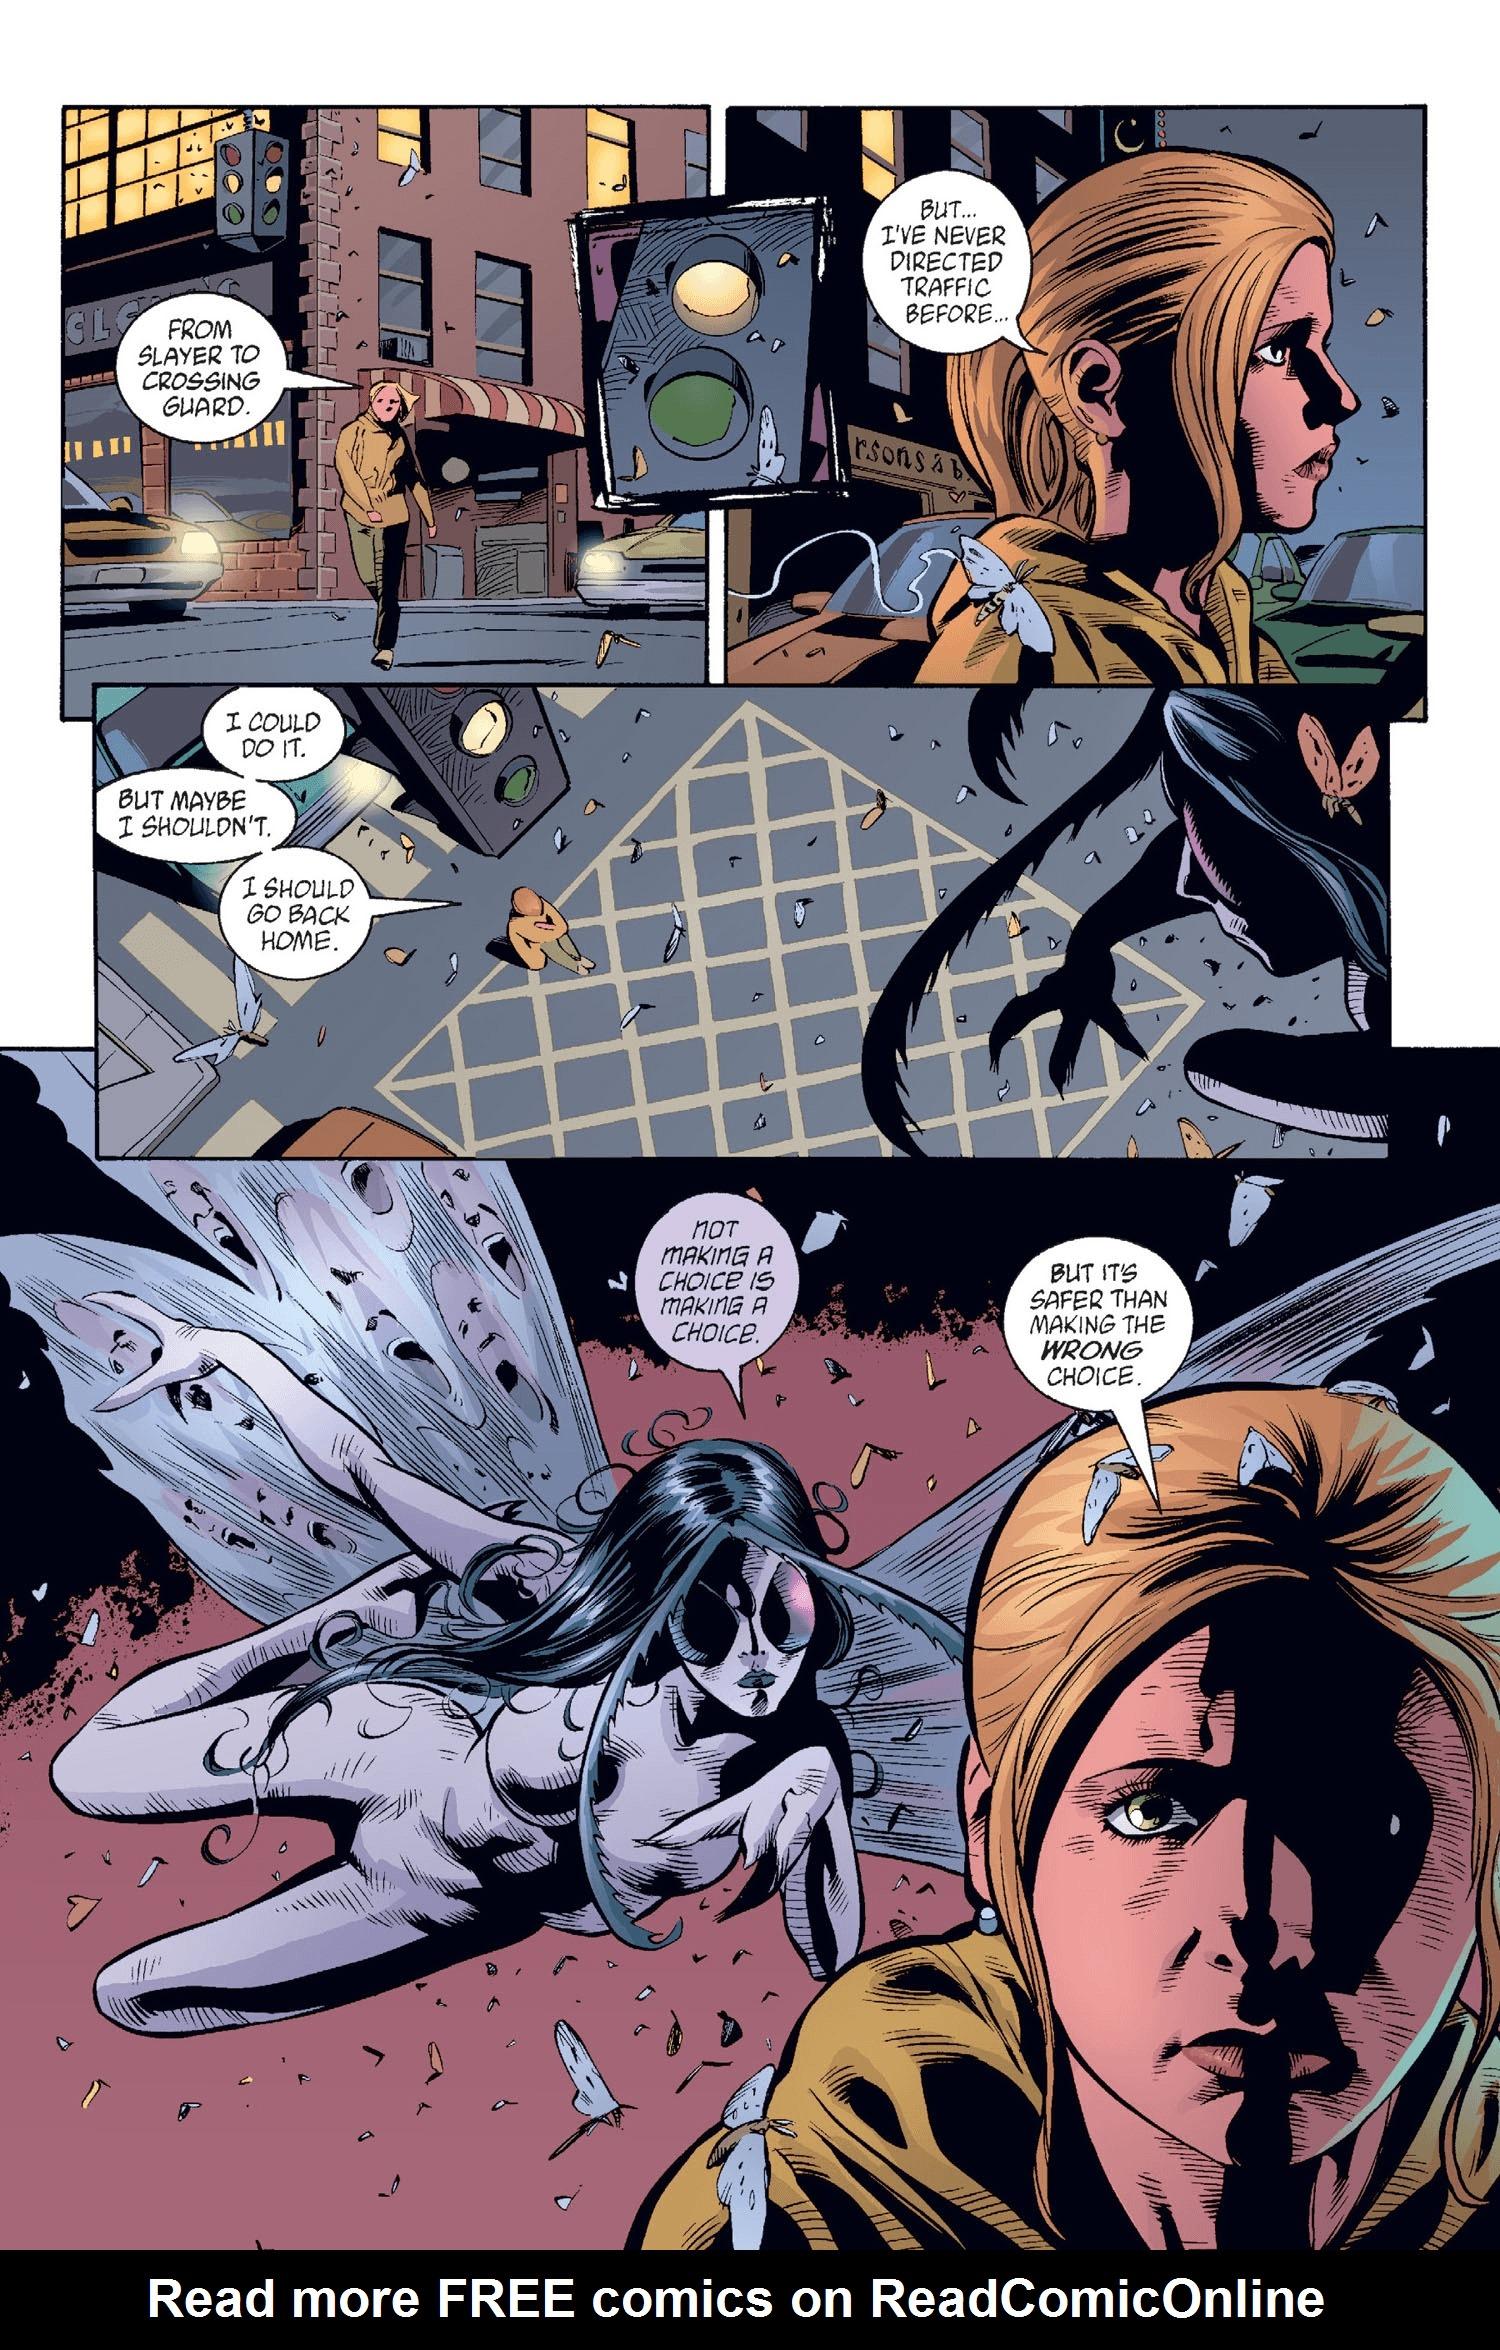 Read online Buffy the Vampire Slayer: Omnibus comic -  Issue # TPB 2 - 97